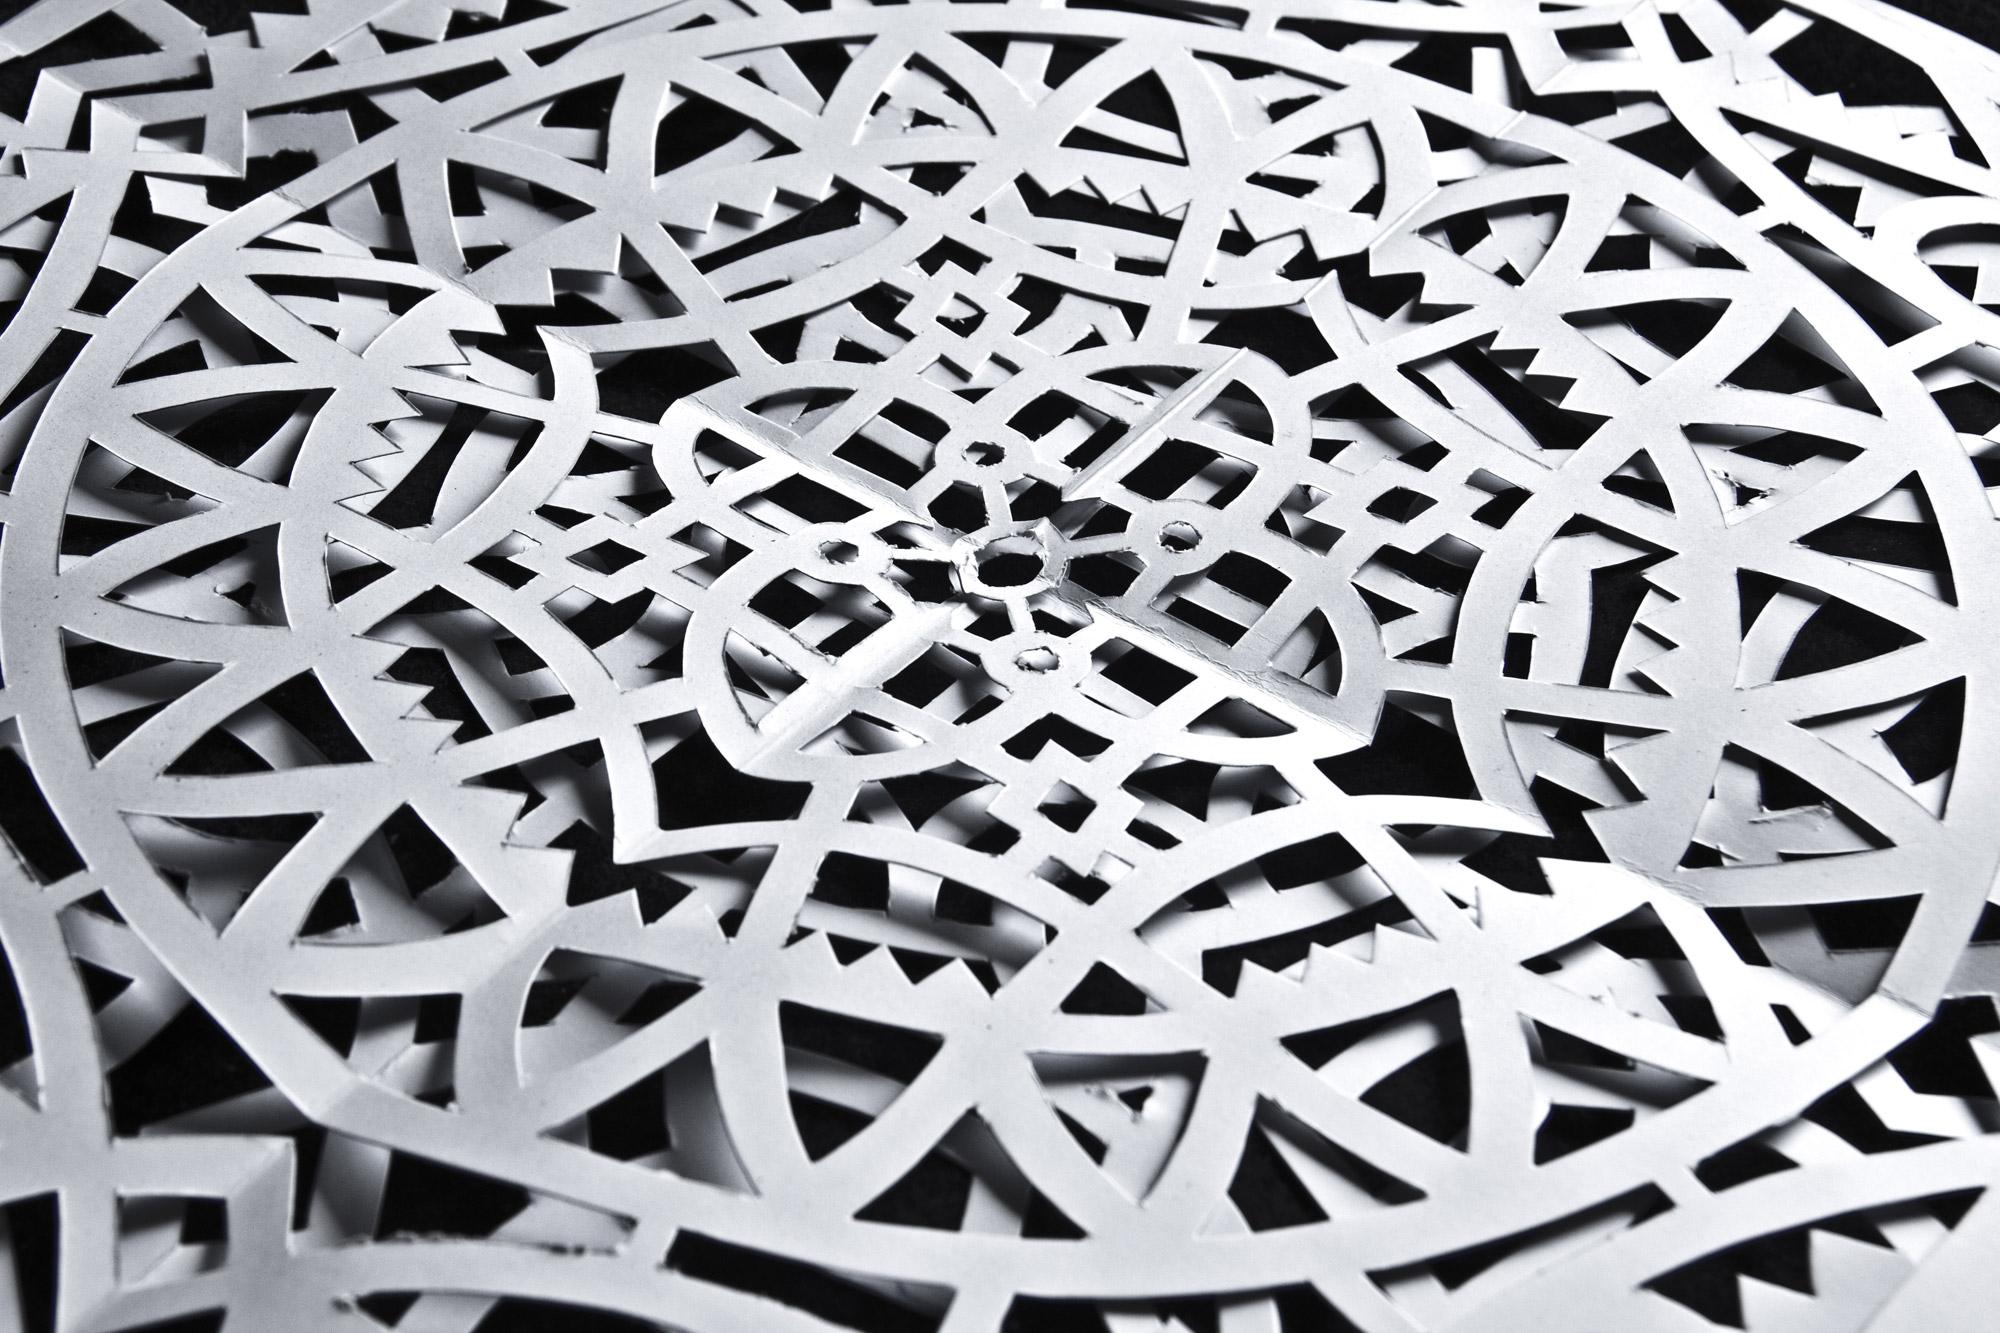 papercutting-workshop2-detail